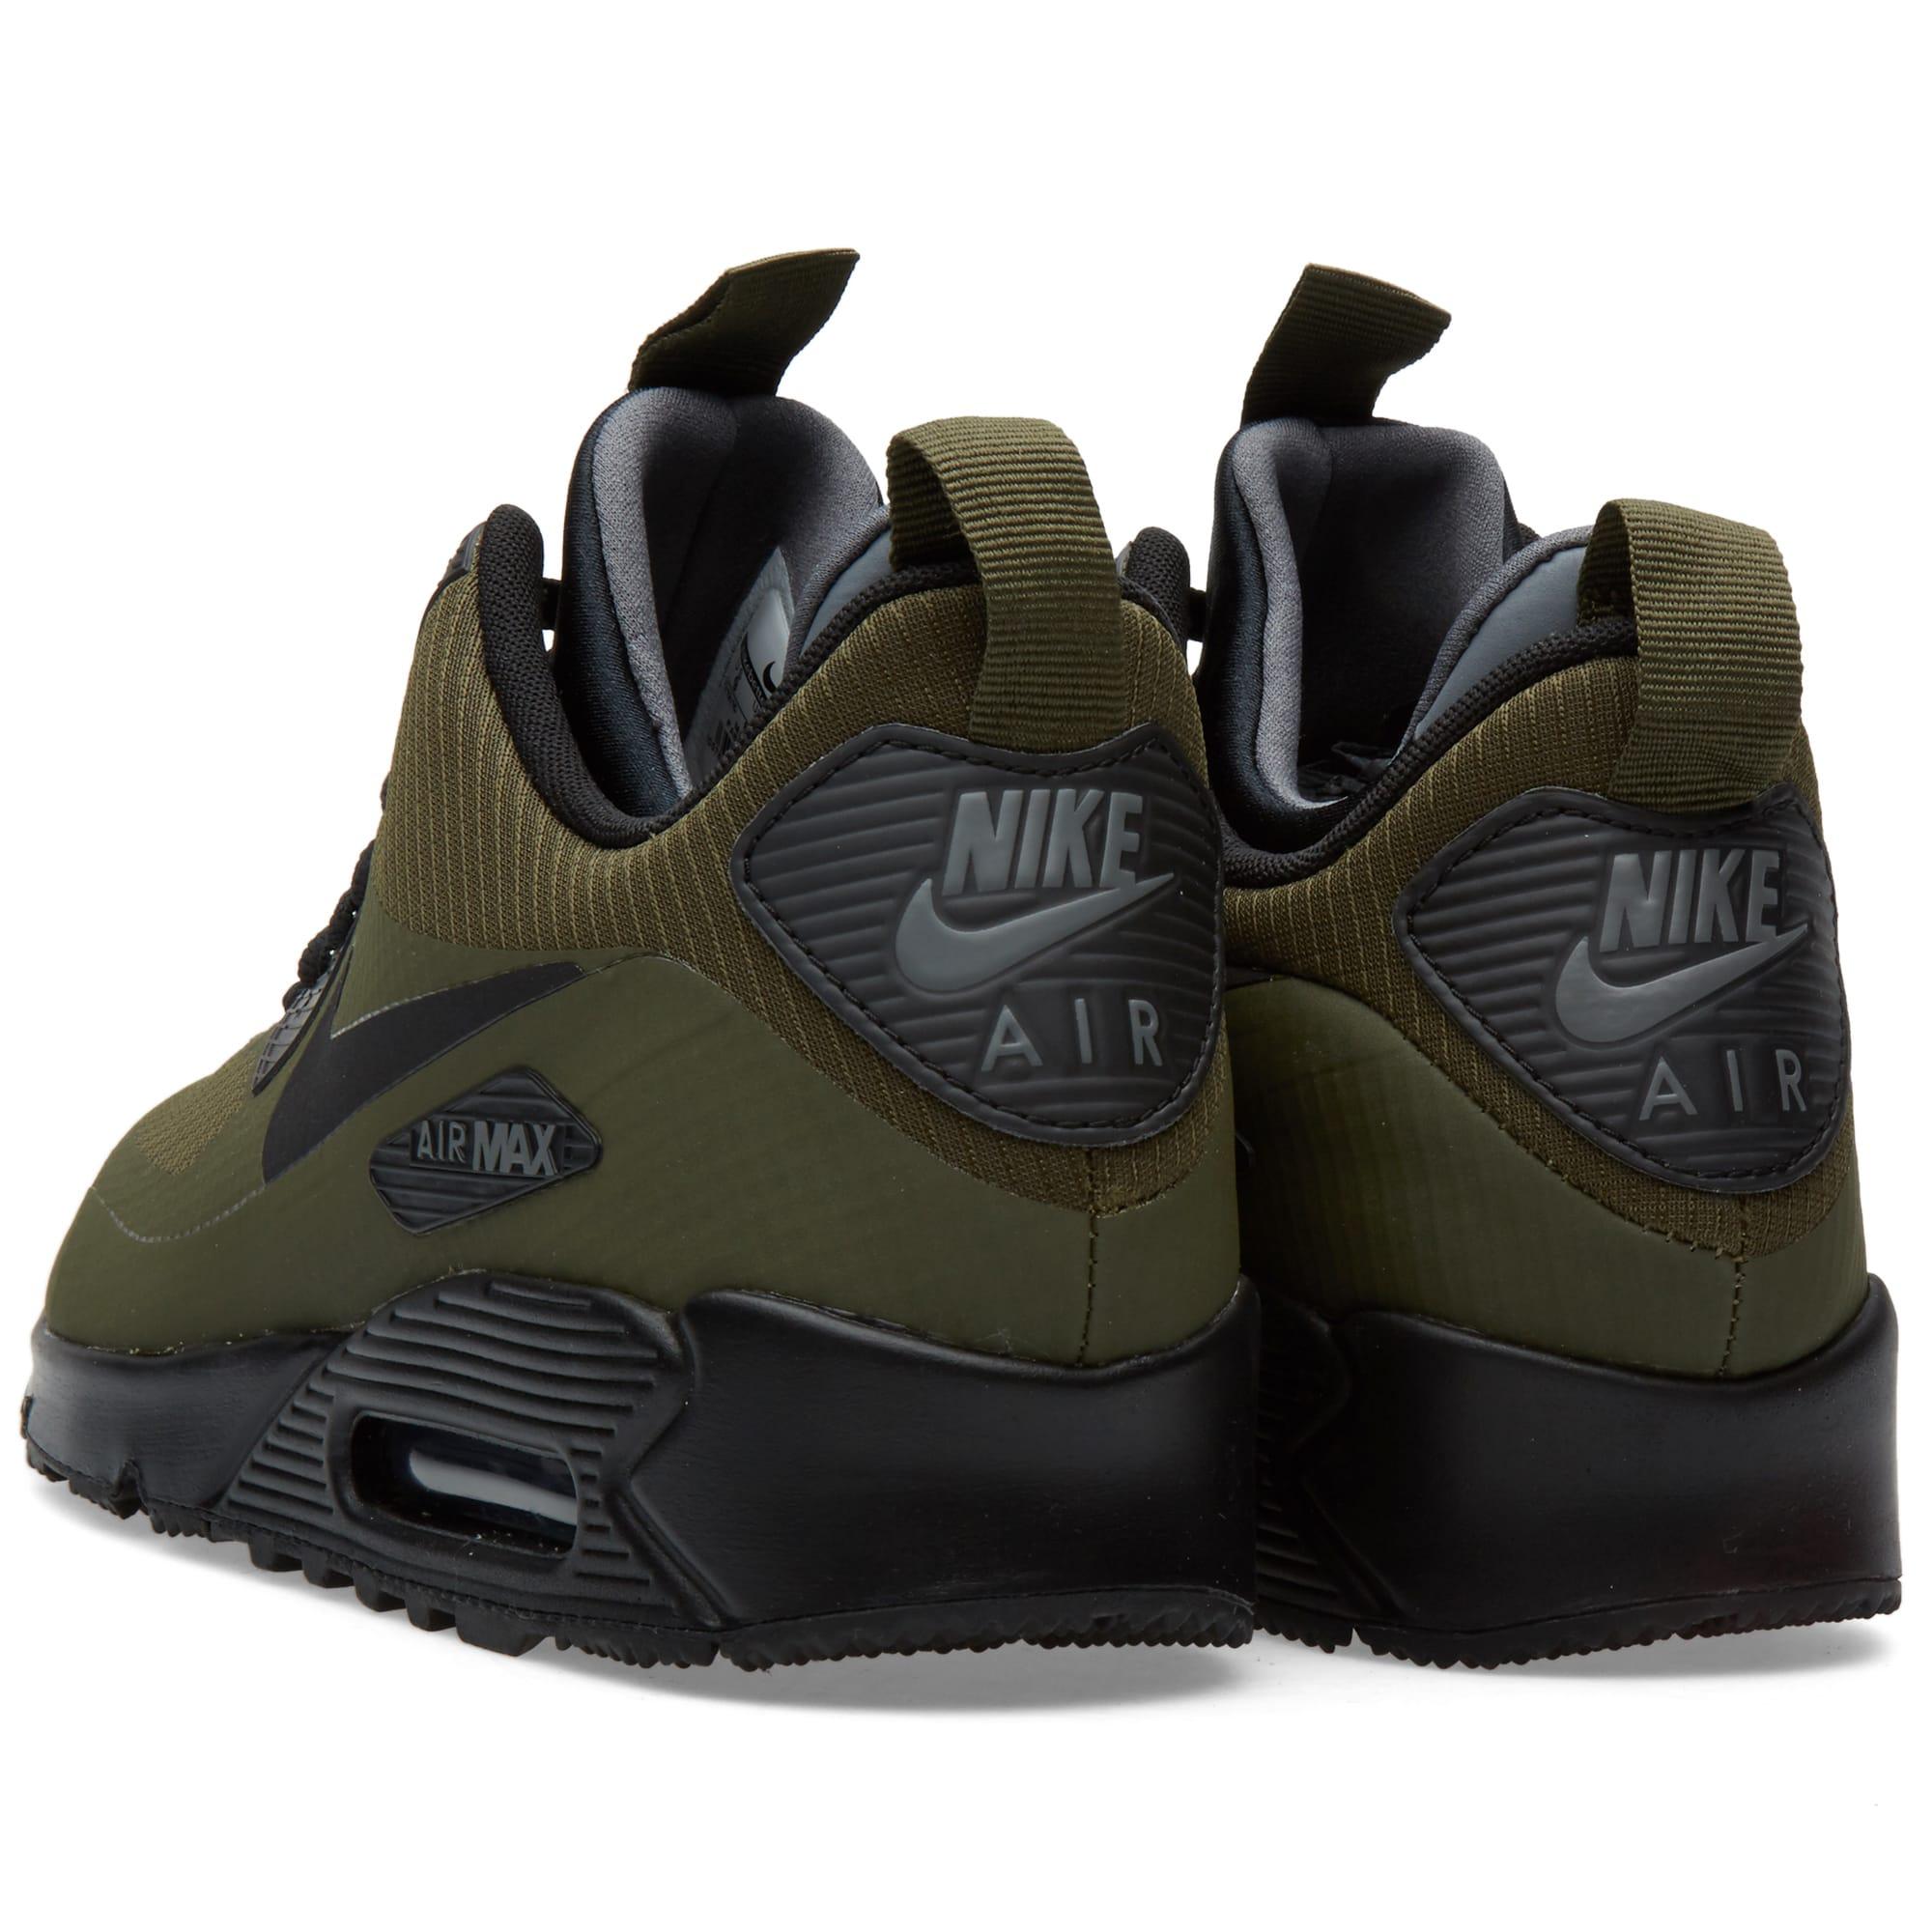 super popular dd2a6 e6504 Nike Air Max 90 Mid Winter